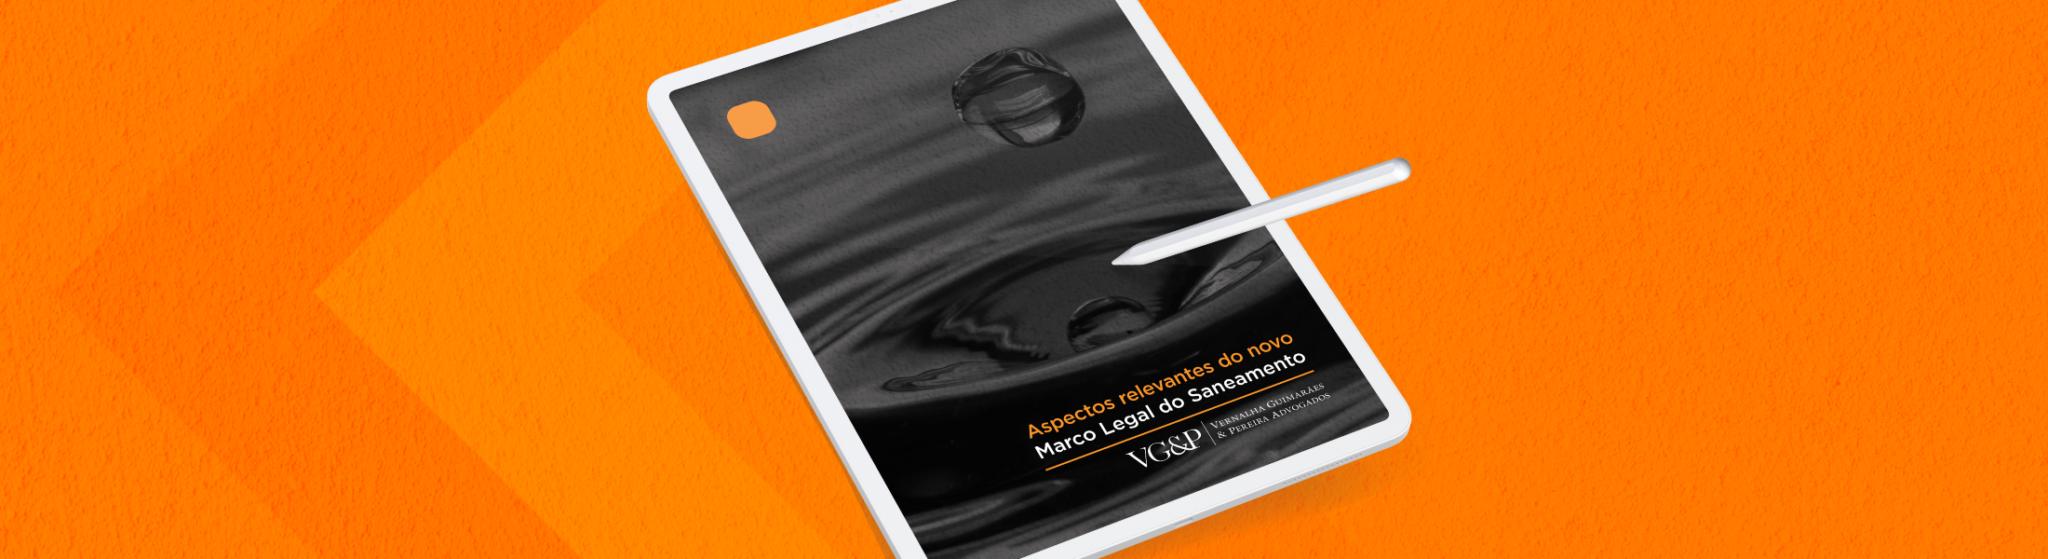 Apresentamos o e-book 'aspectos relevantes do novo marco legal do saneamento'